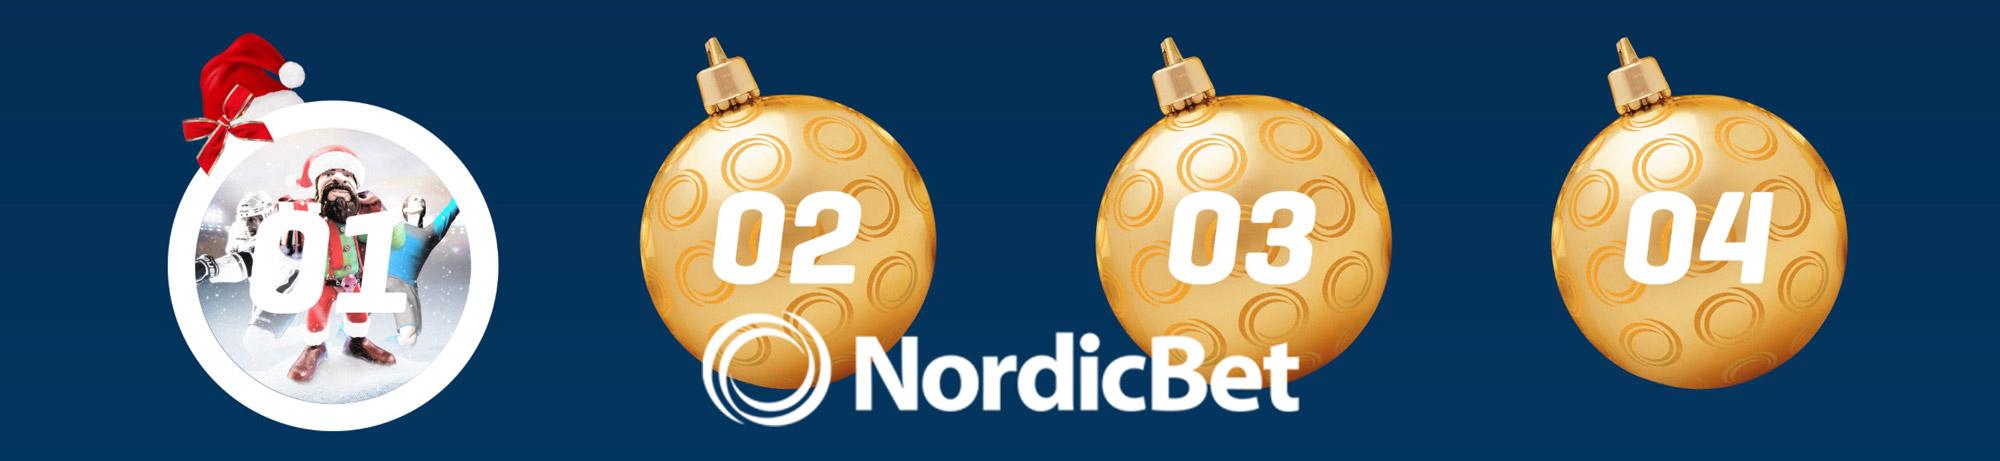 nordicbet-casino-julkalender